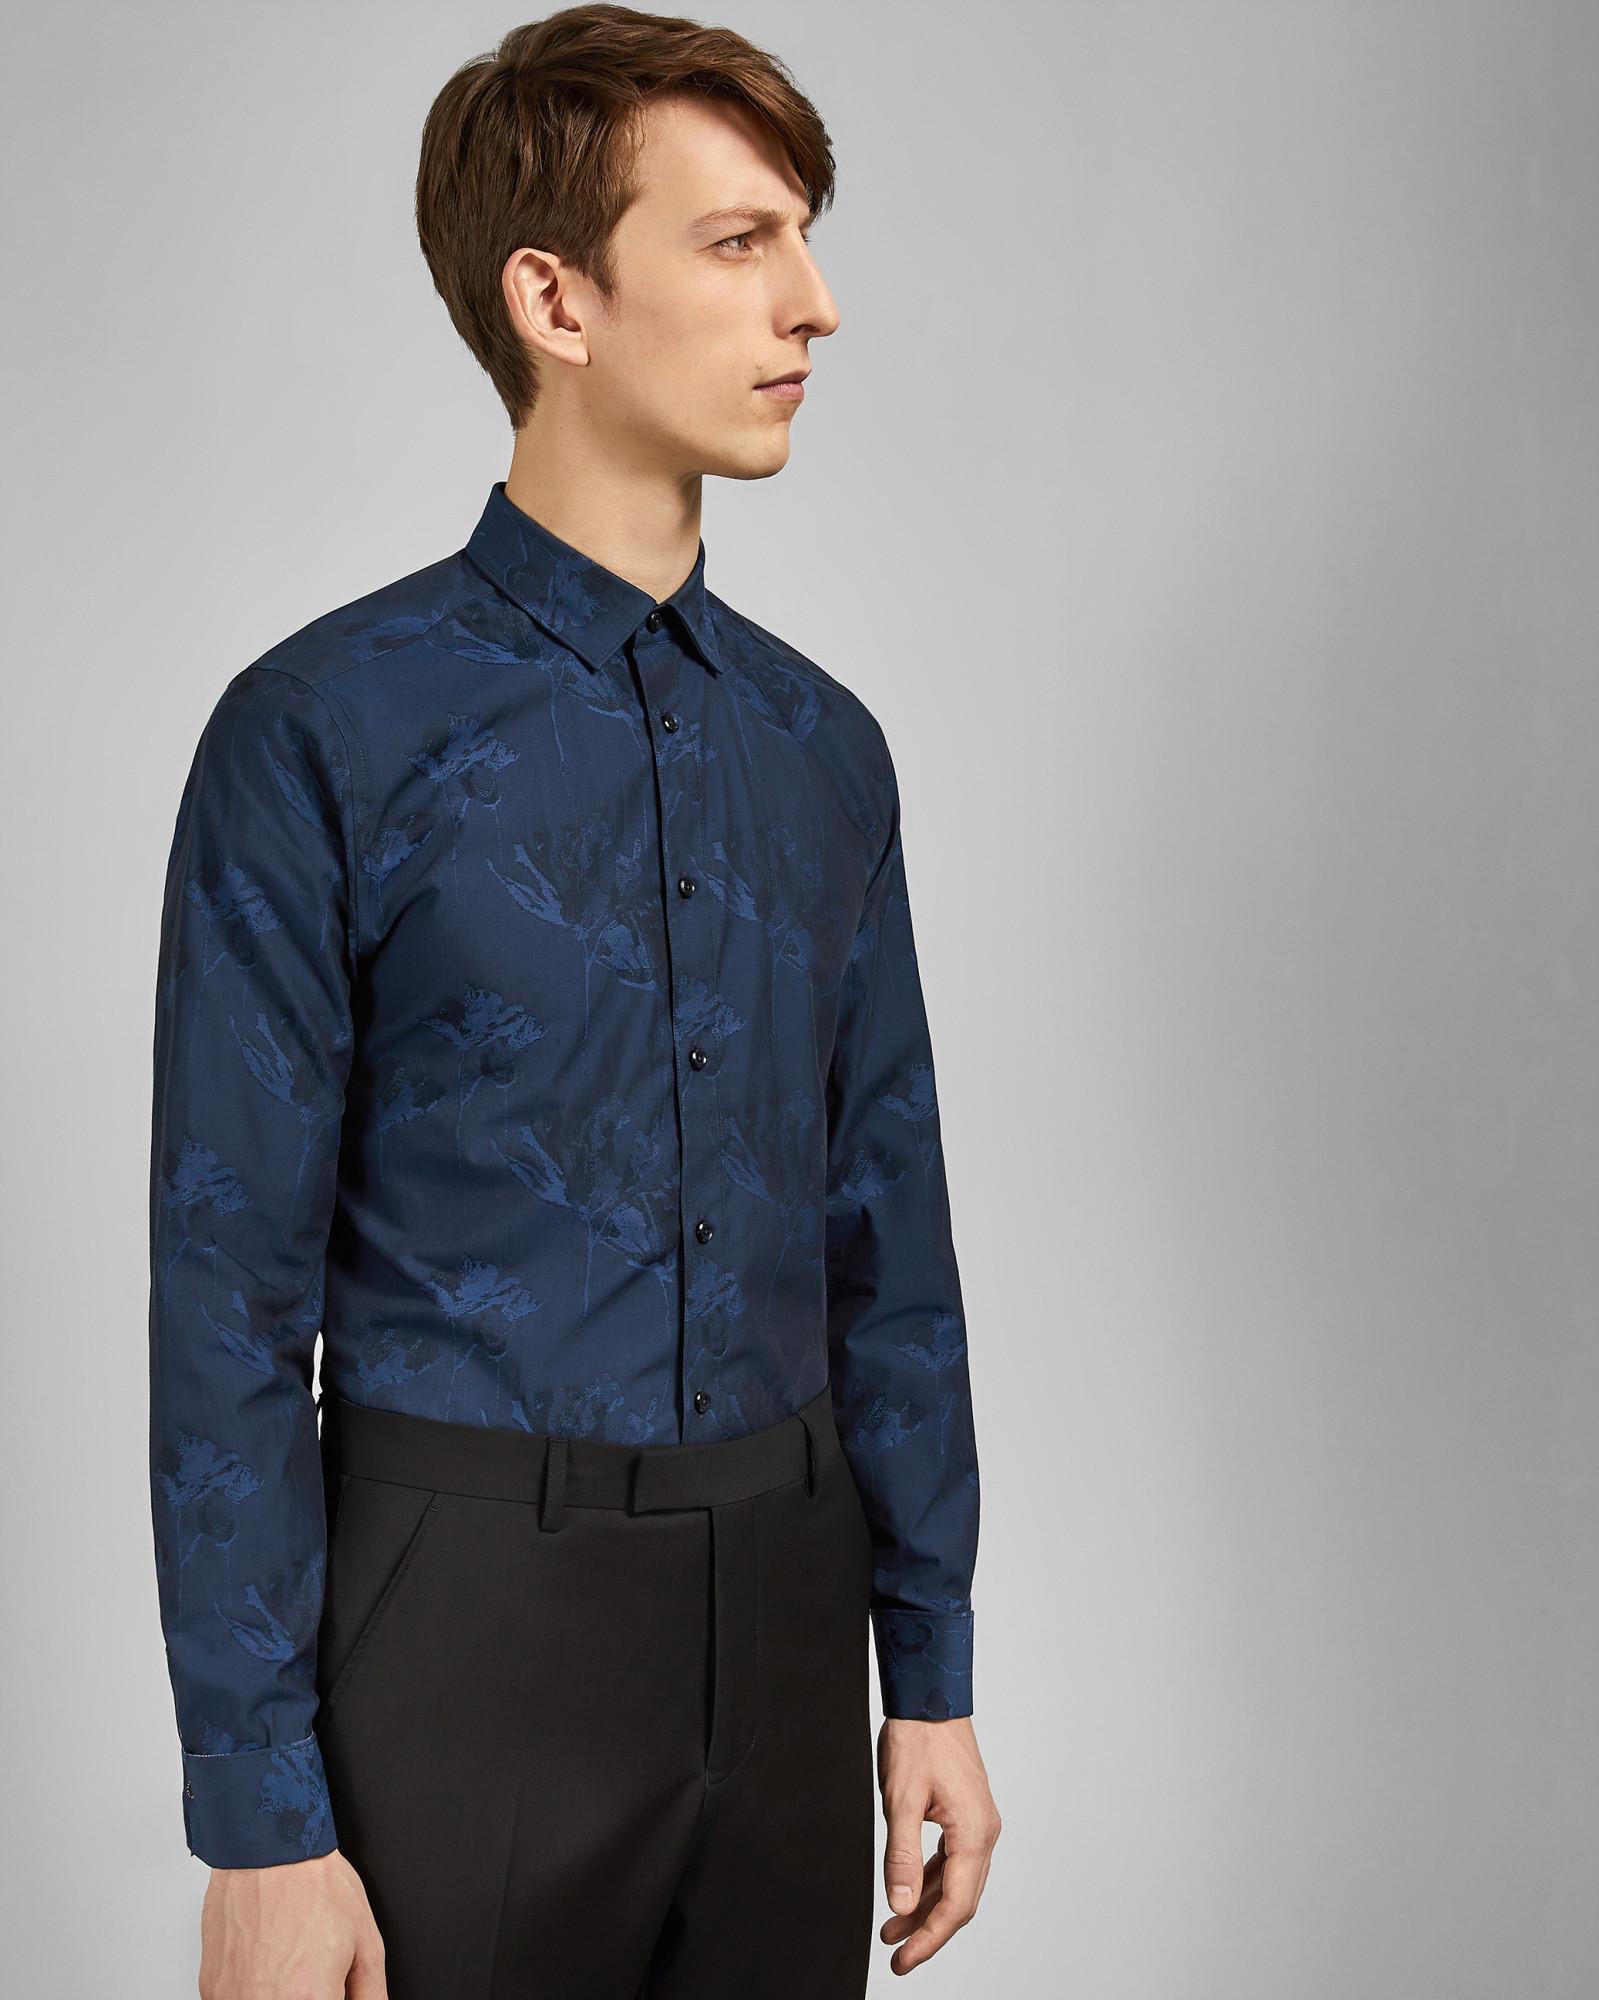 1d0359fb735e5 Ted Baker Floral Cotton Jacquard Shirt in Blue for Men - Lyst